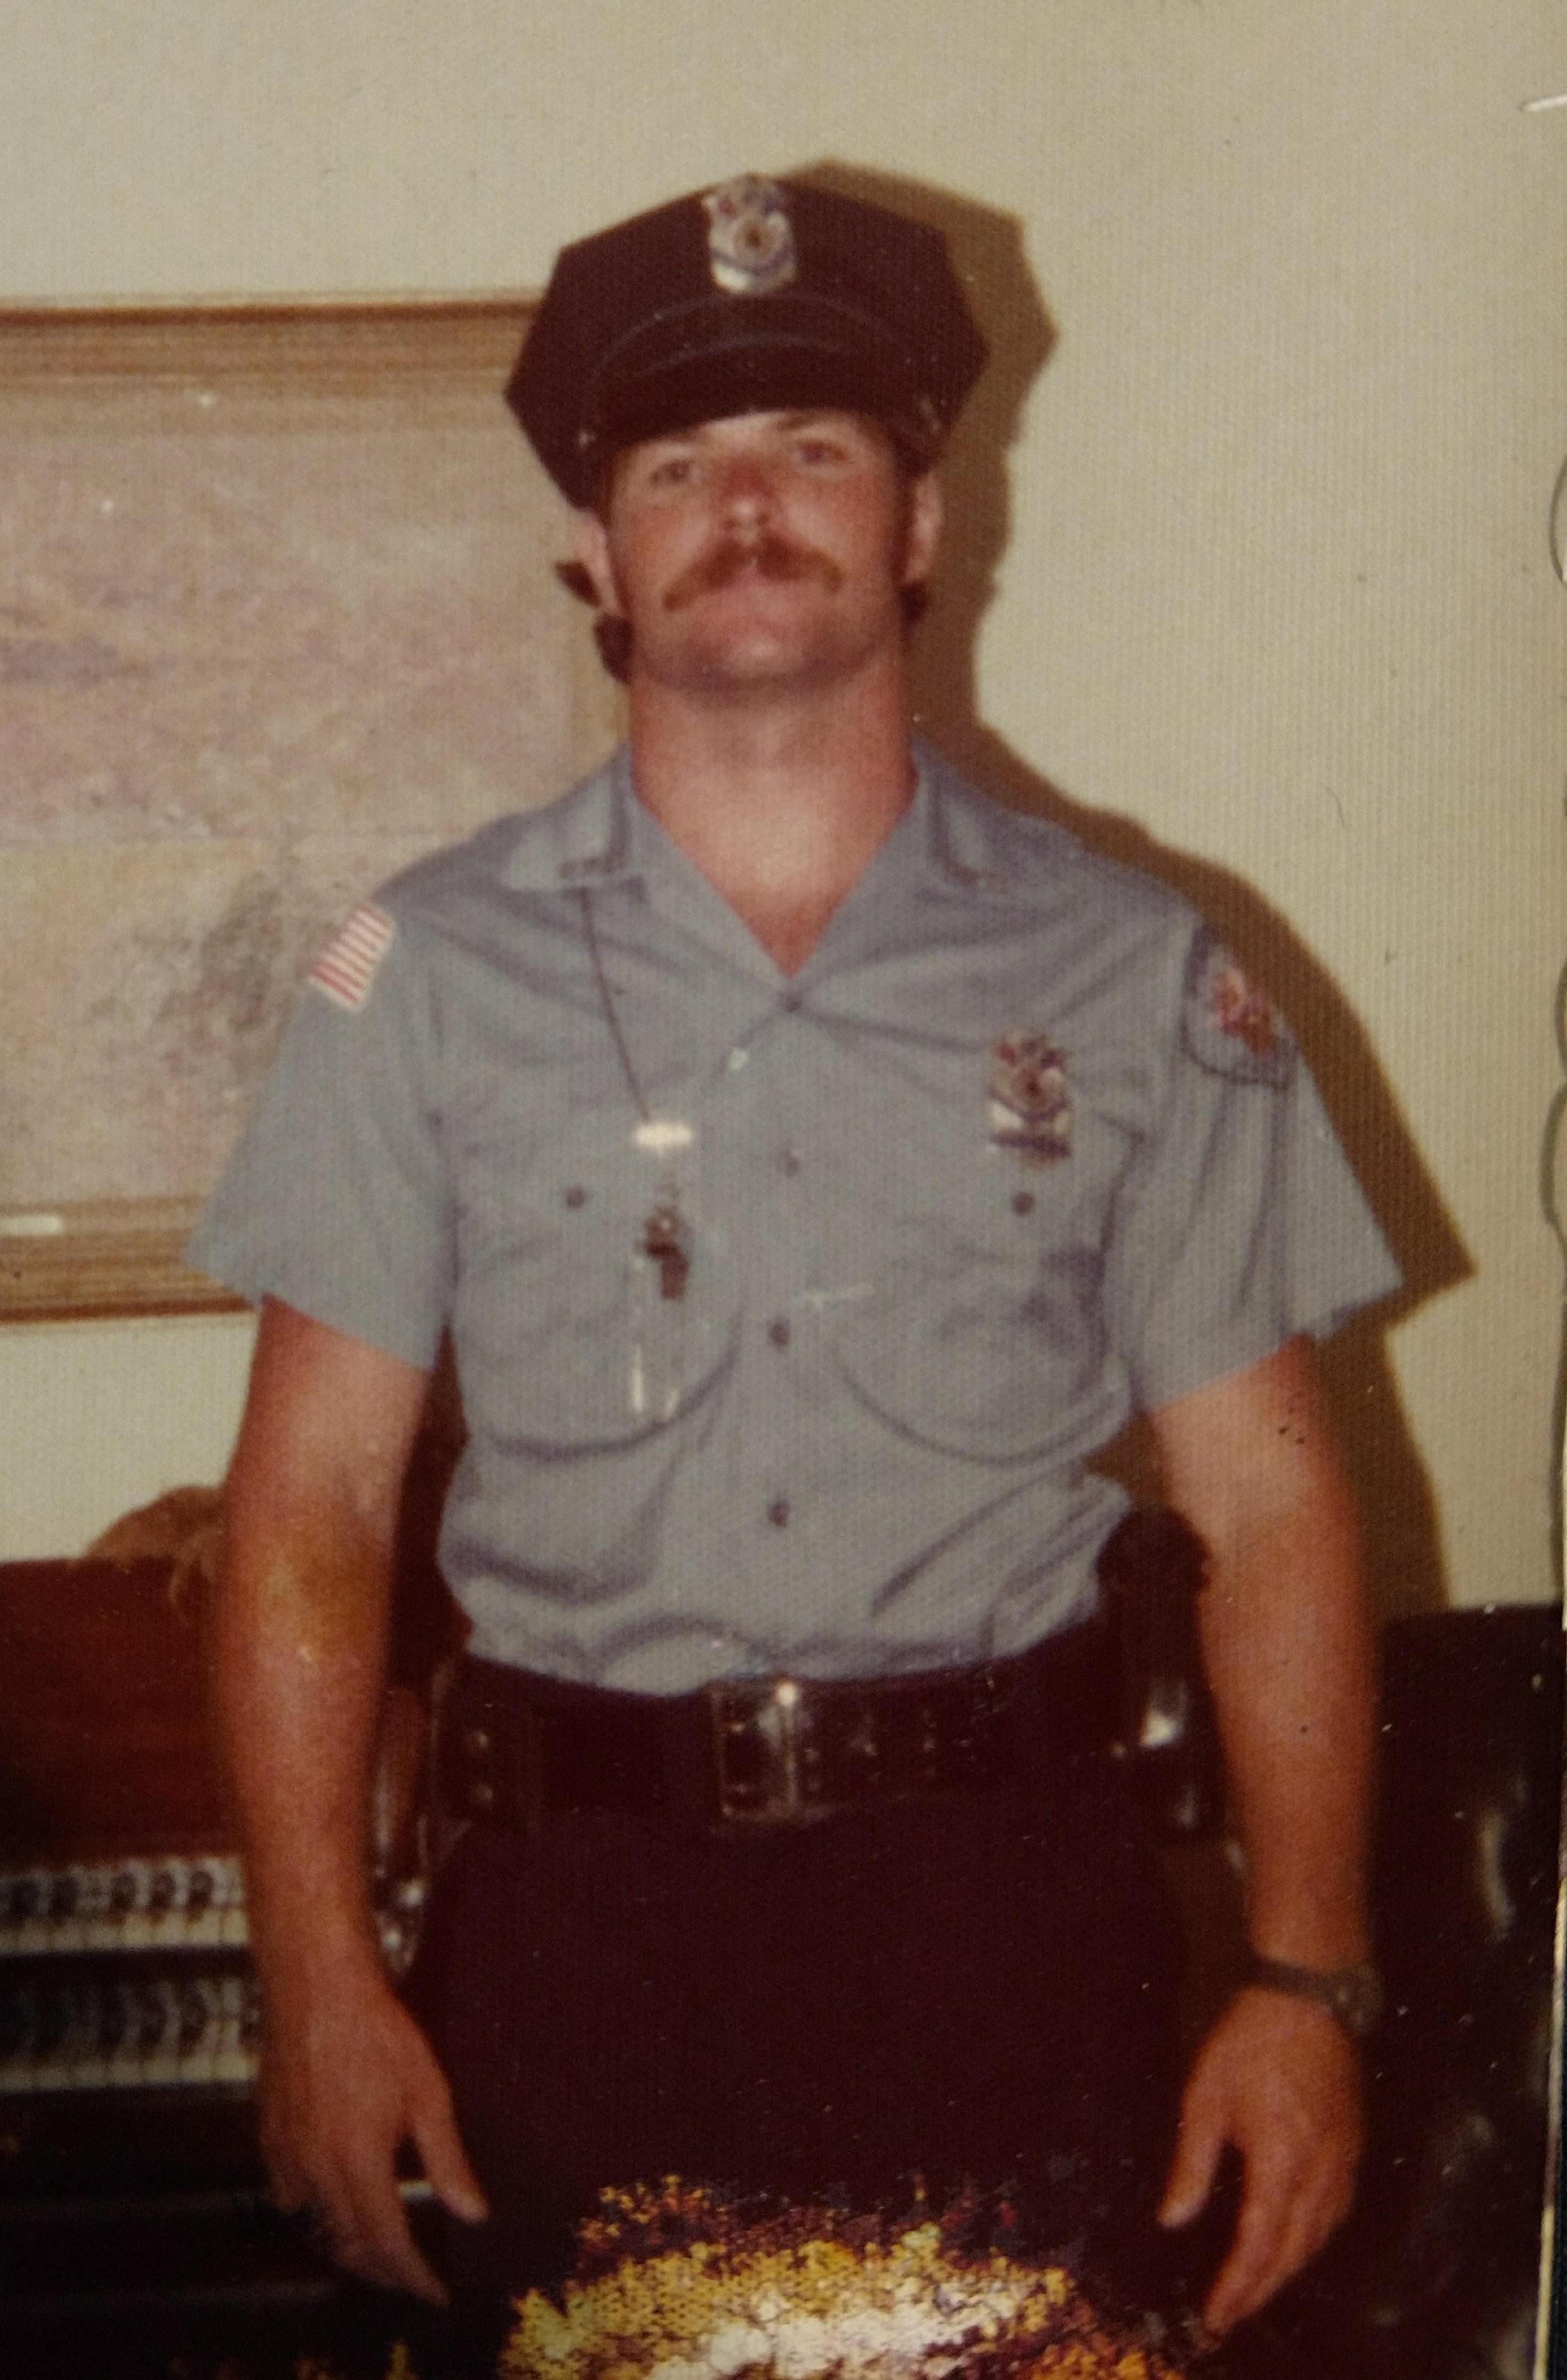 Investigator Steven Paul Bolyard | Florida State Attorney's Office - 1st Judicial Circuit, Florida